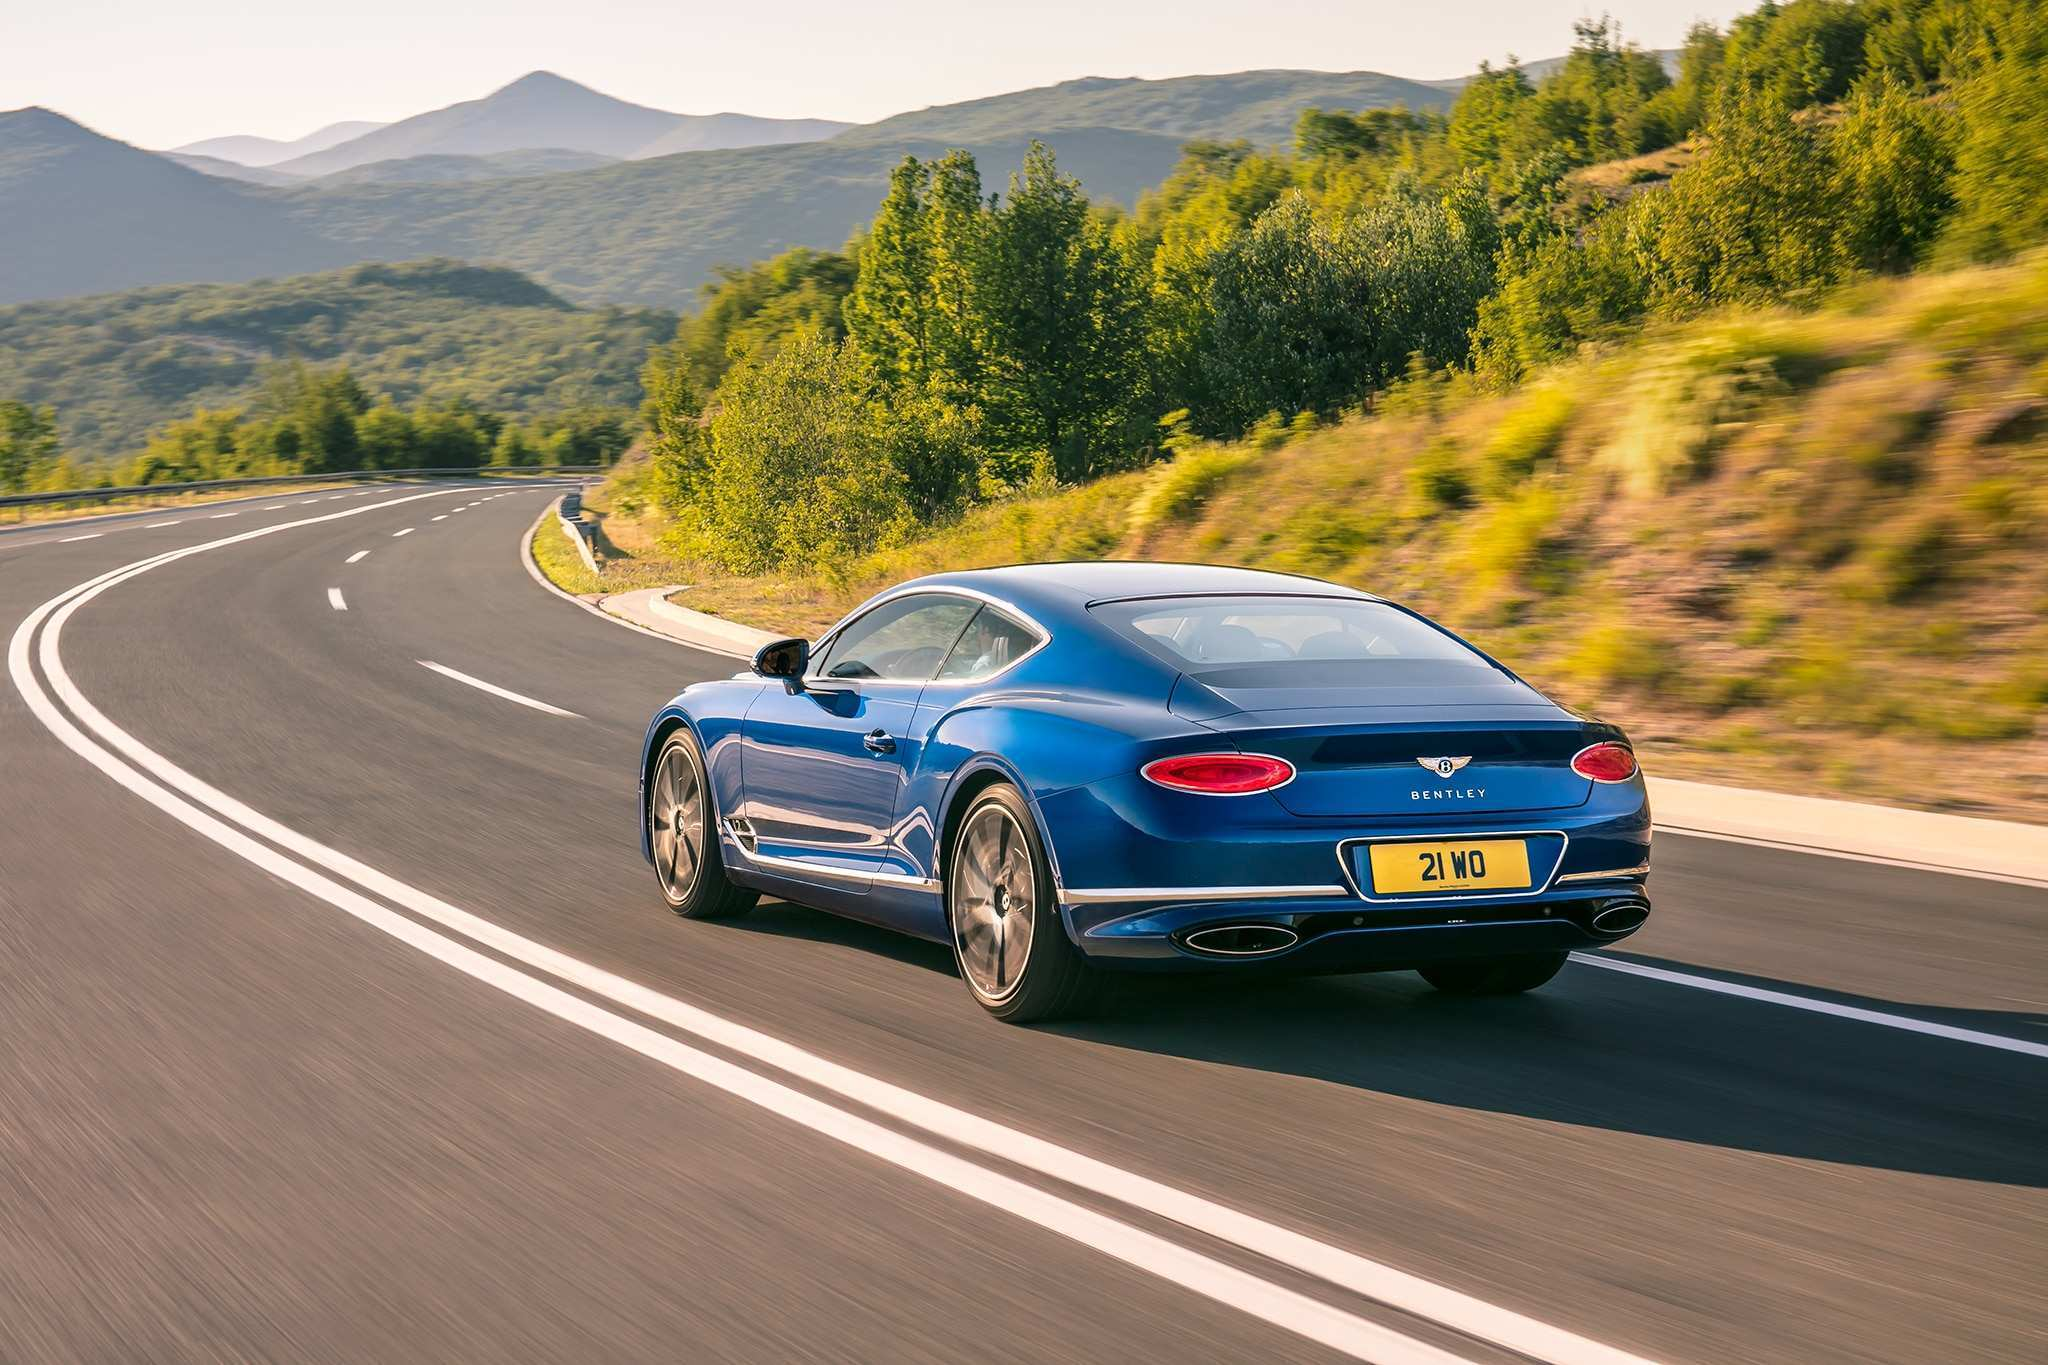 51 Gallery of 2019 Bentley Price Redesign with 2019 Bentley Price